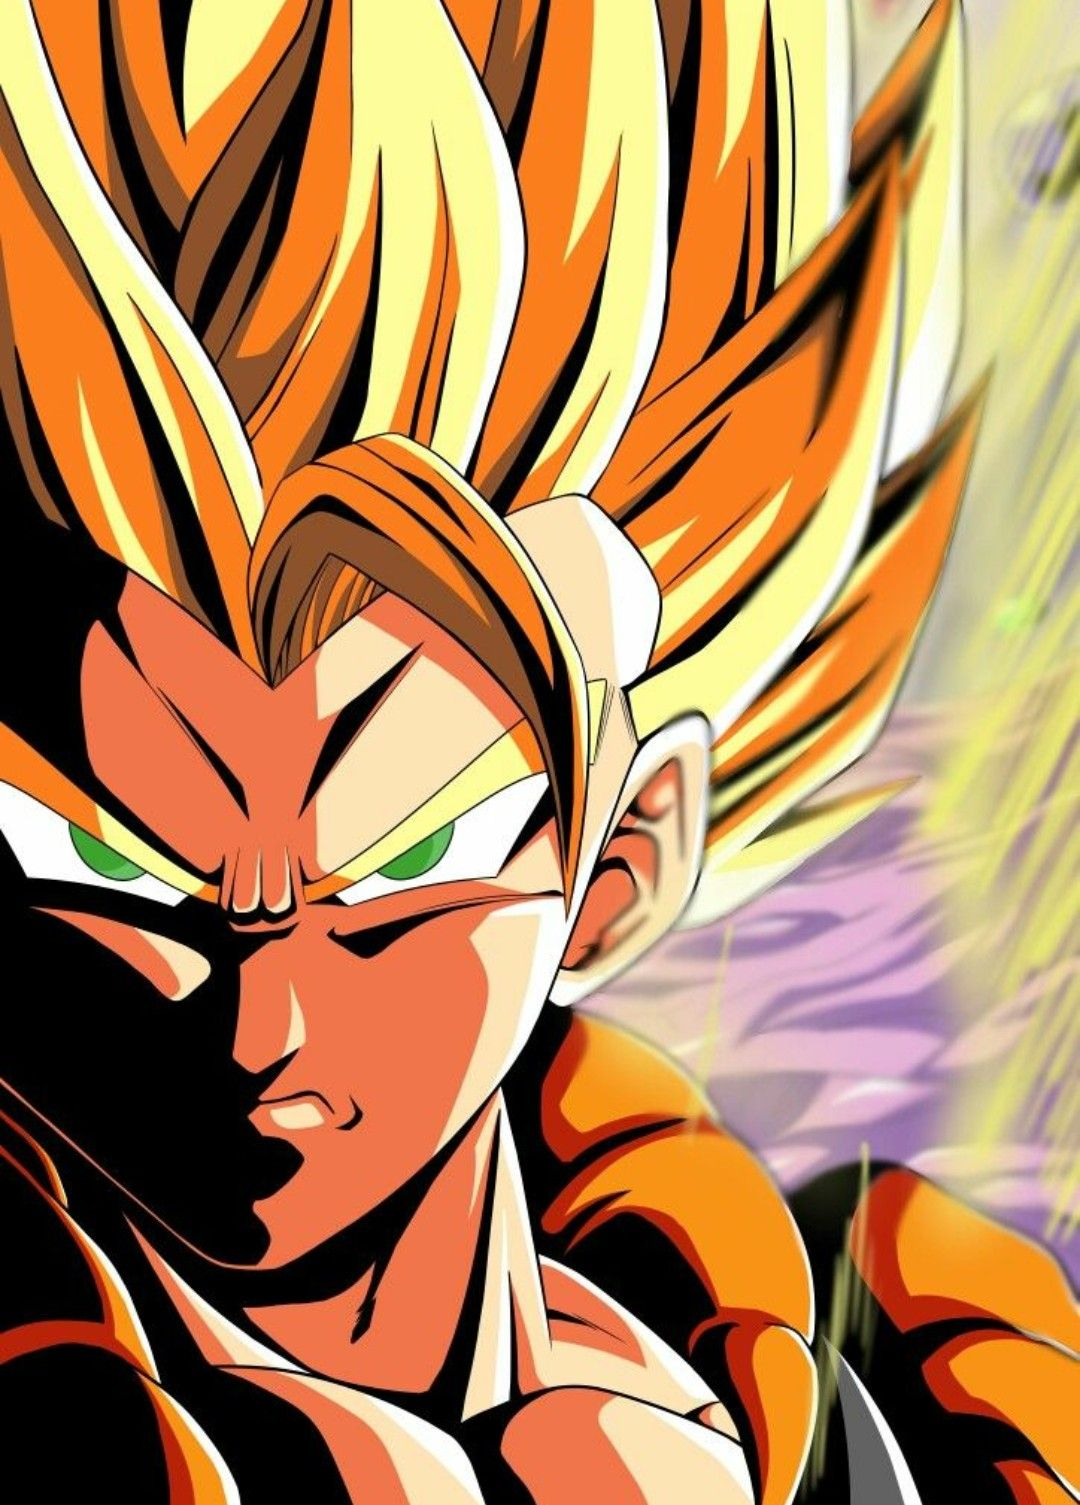 Pin De Ha Anime En Neo Dragon Ball Team Z Super En 2020 Dibujo De Goku Personajes De Dragon Ball Dragones